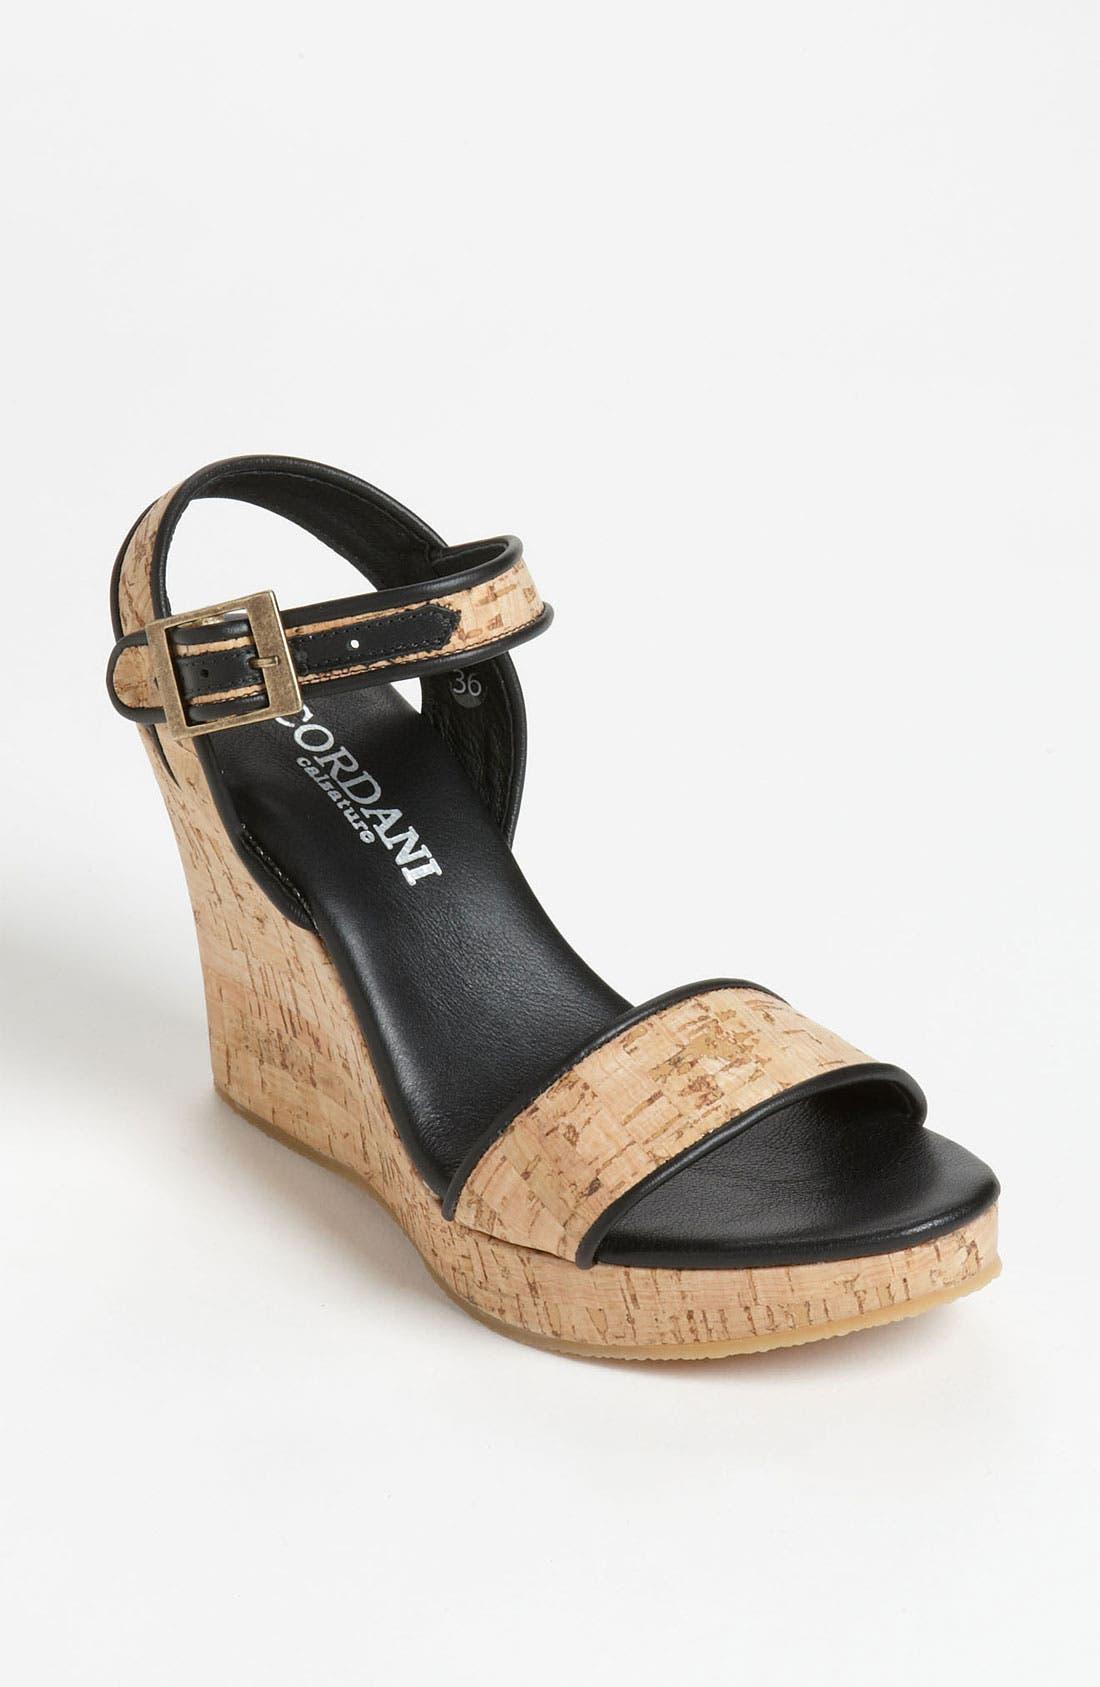 Alternate Image 1 Selected - Cordani 'Wales' Sandal